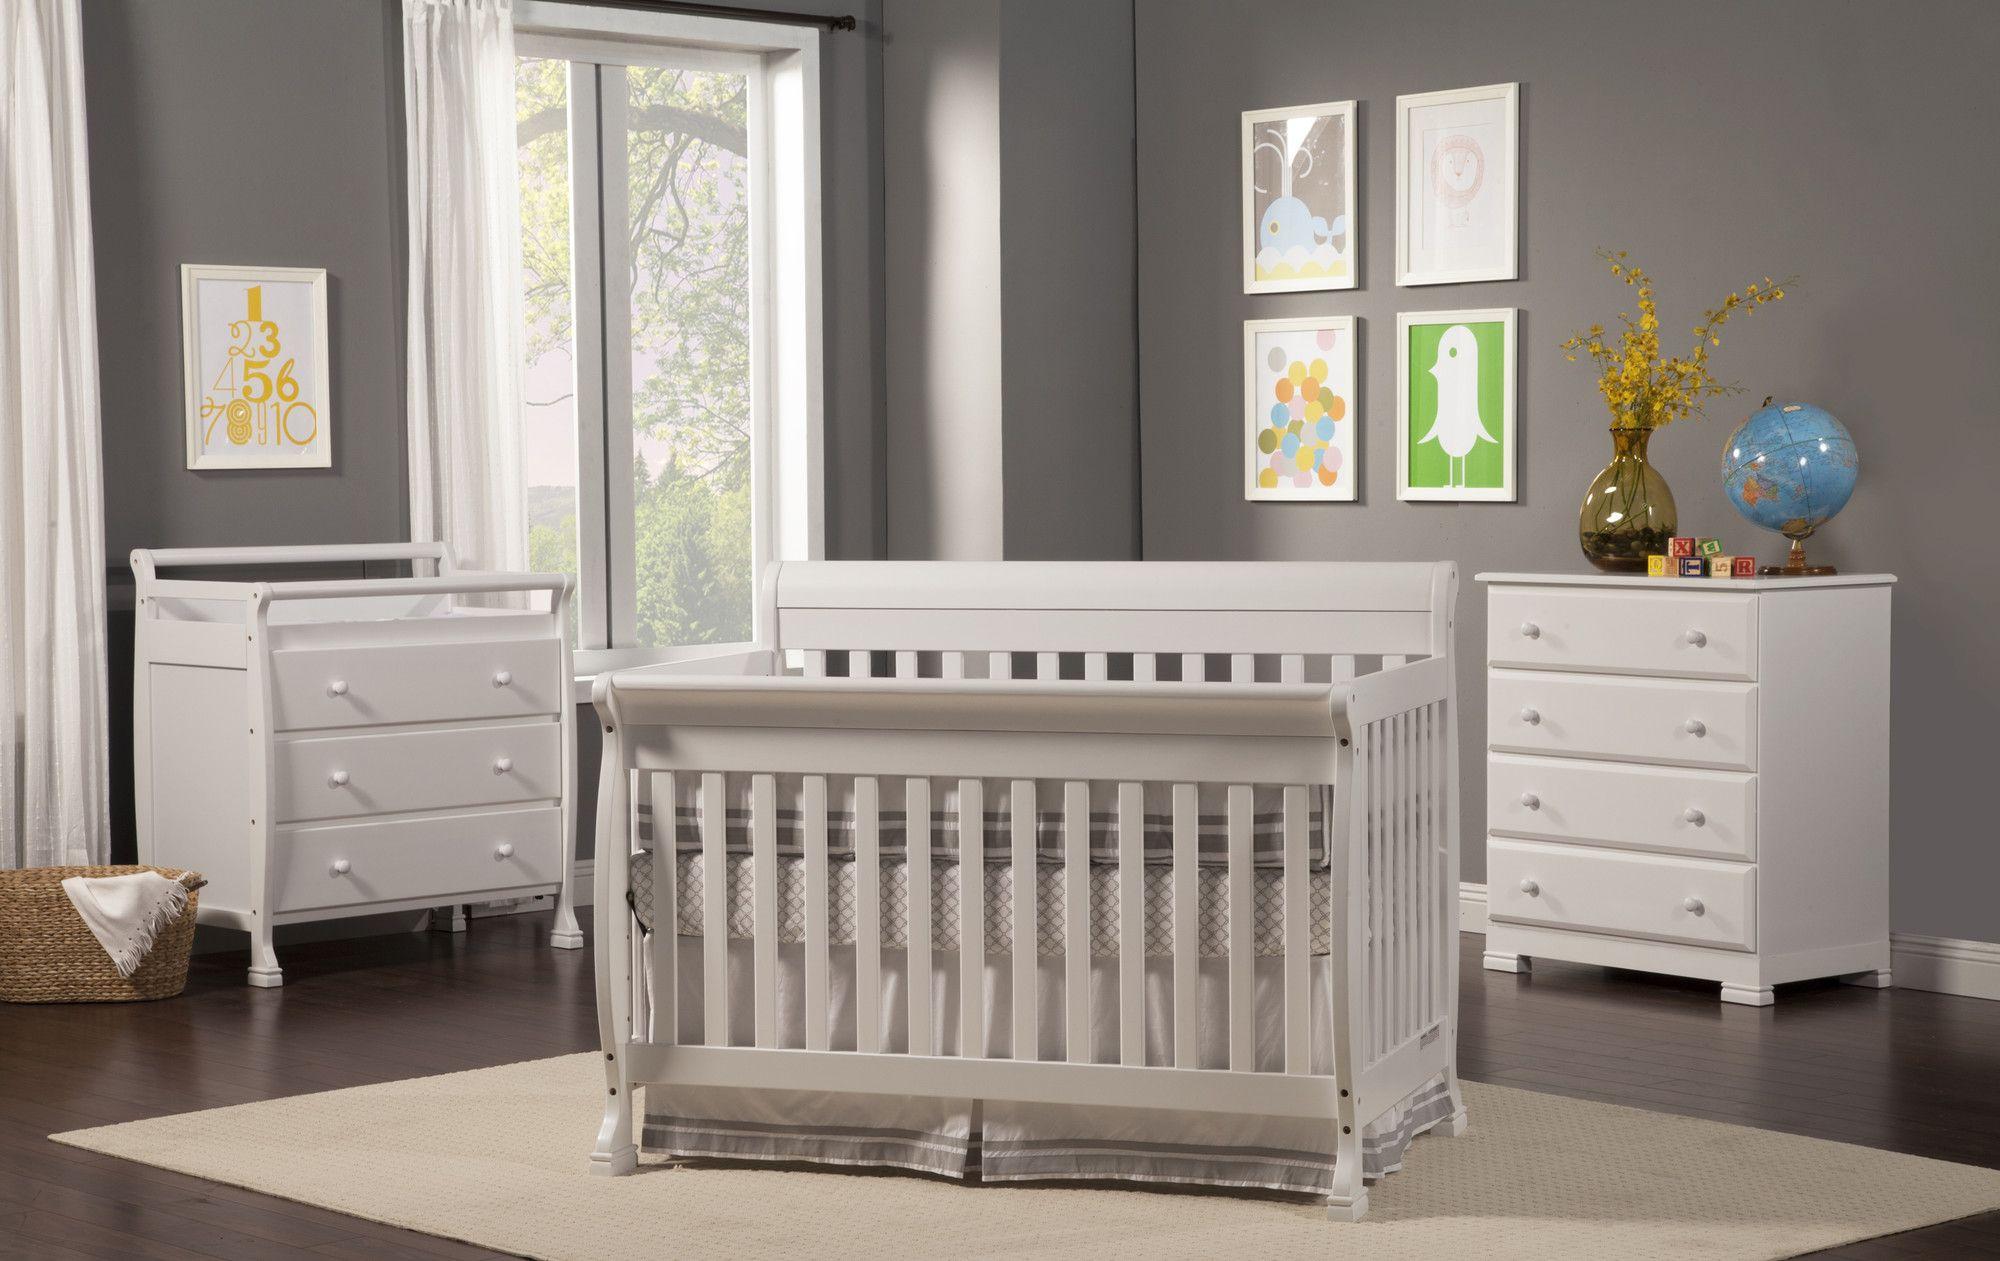 Kalani 4 In 1 Convertible Crib Convertible Crib Nursery